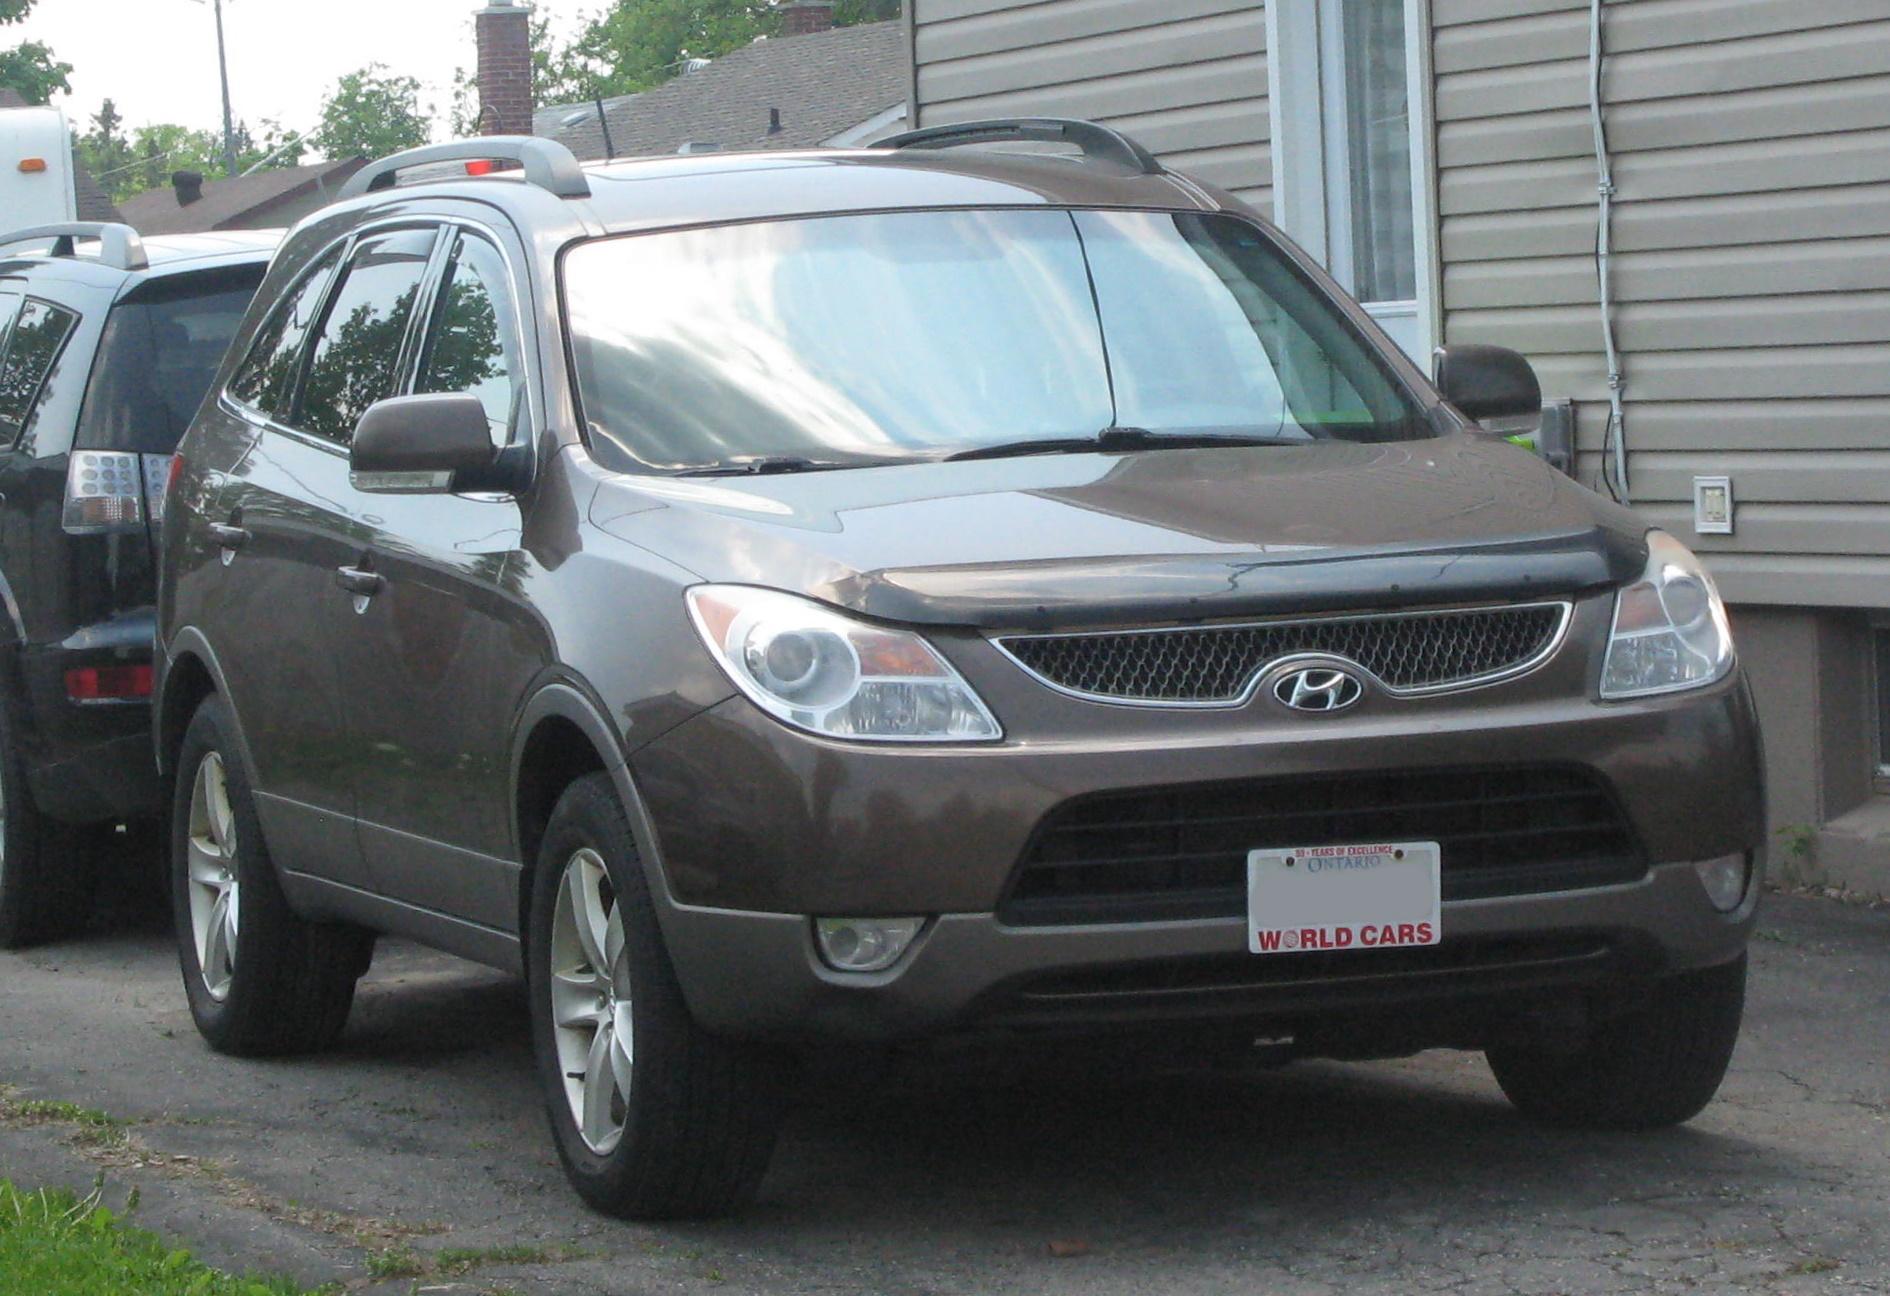 File:2010 Hyundai Veracruz, Front Right, 06-02-2020.jpg ...